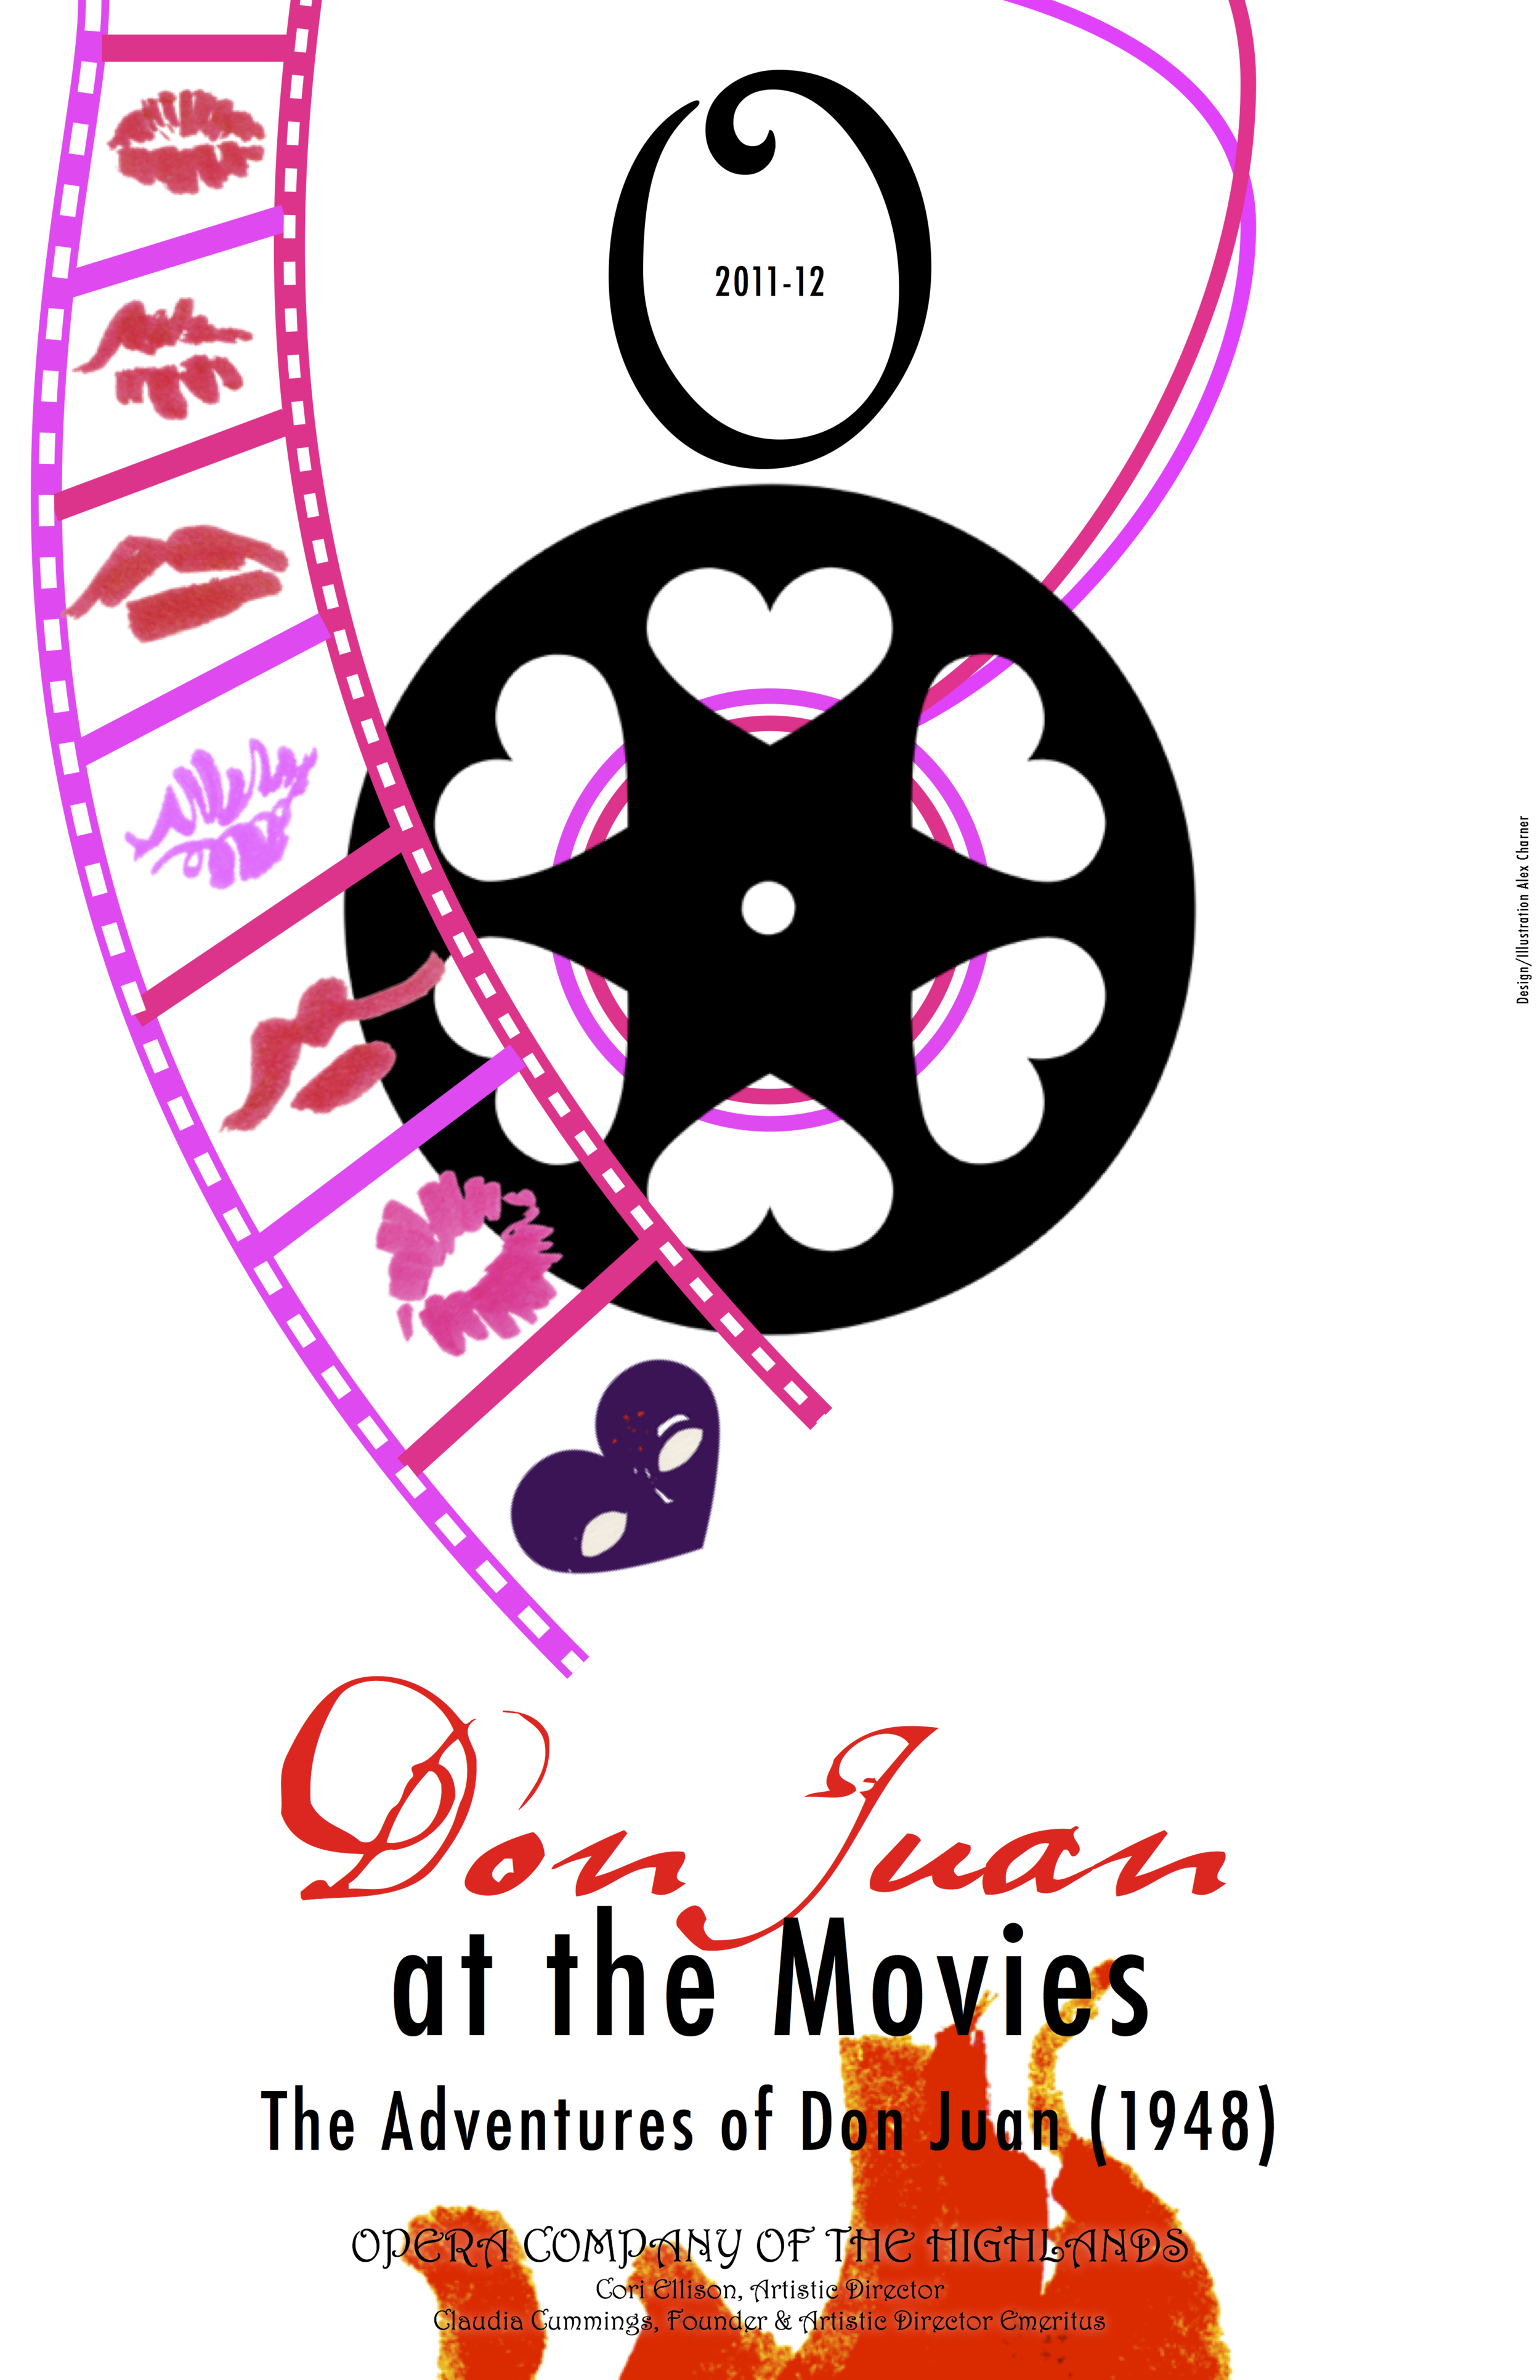 Don Juan at the Movies: The Adventures of Don Juan (1948)